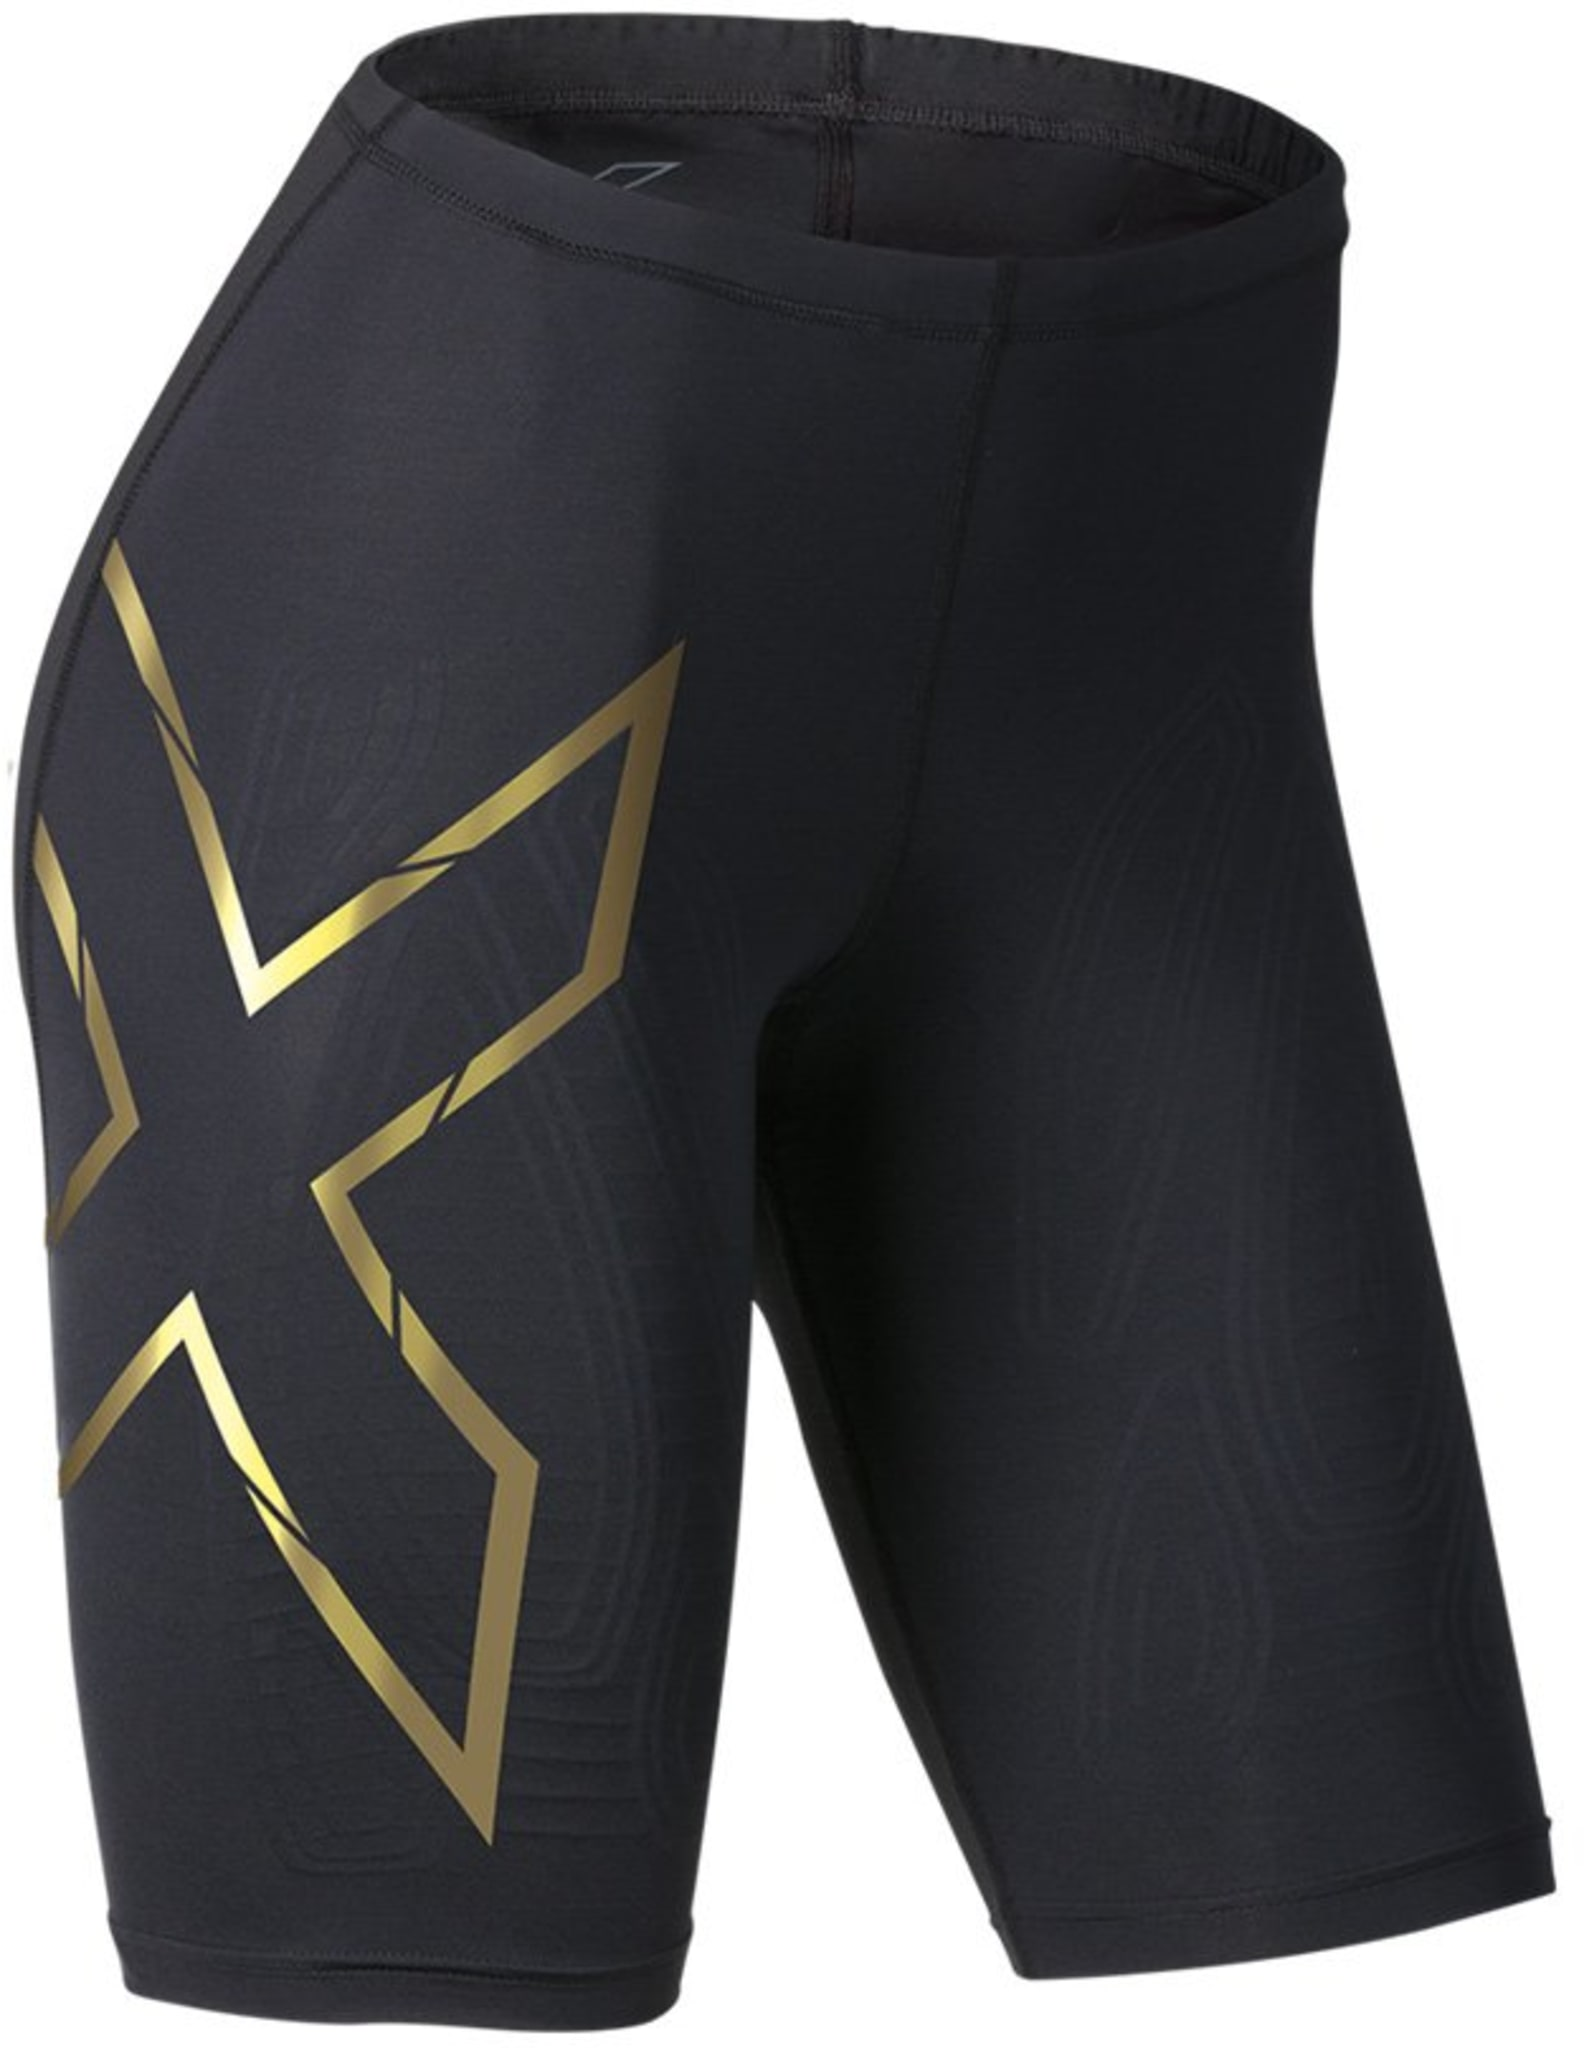 MCS Run Compression Shorts W